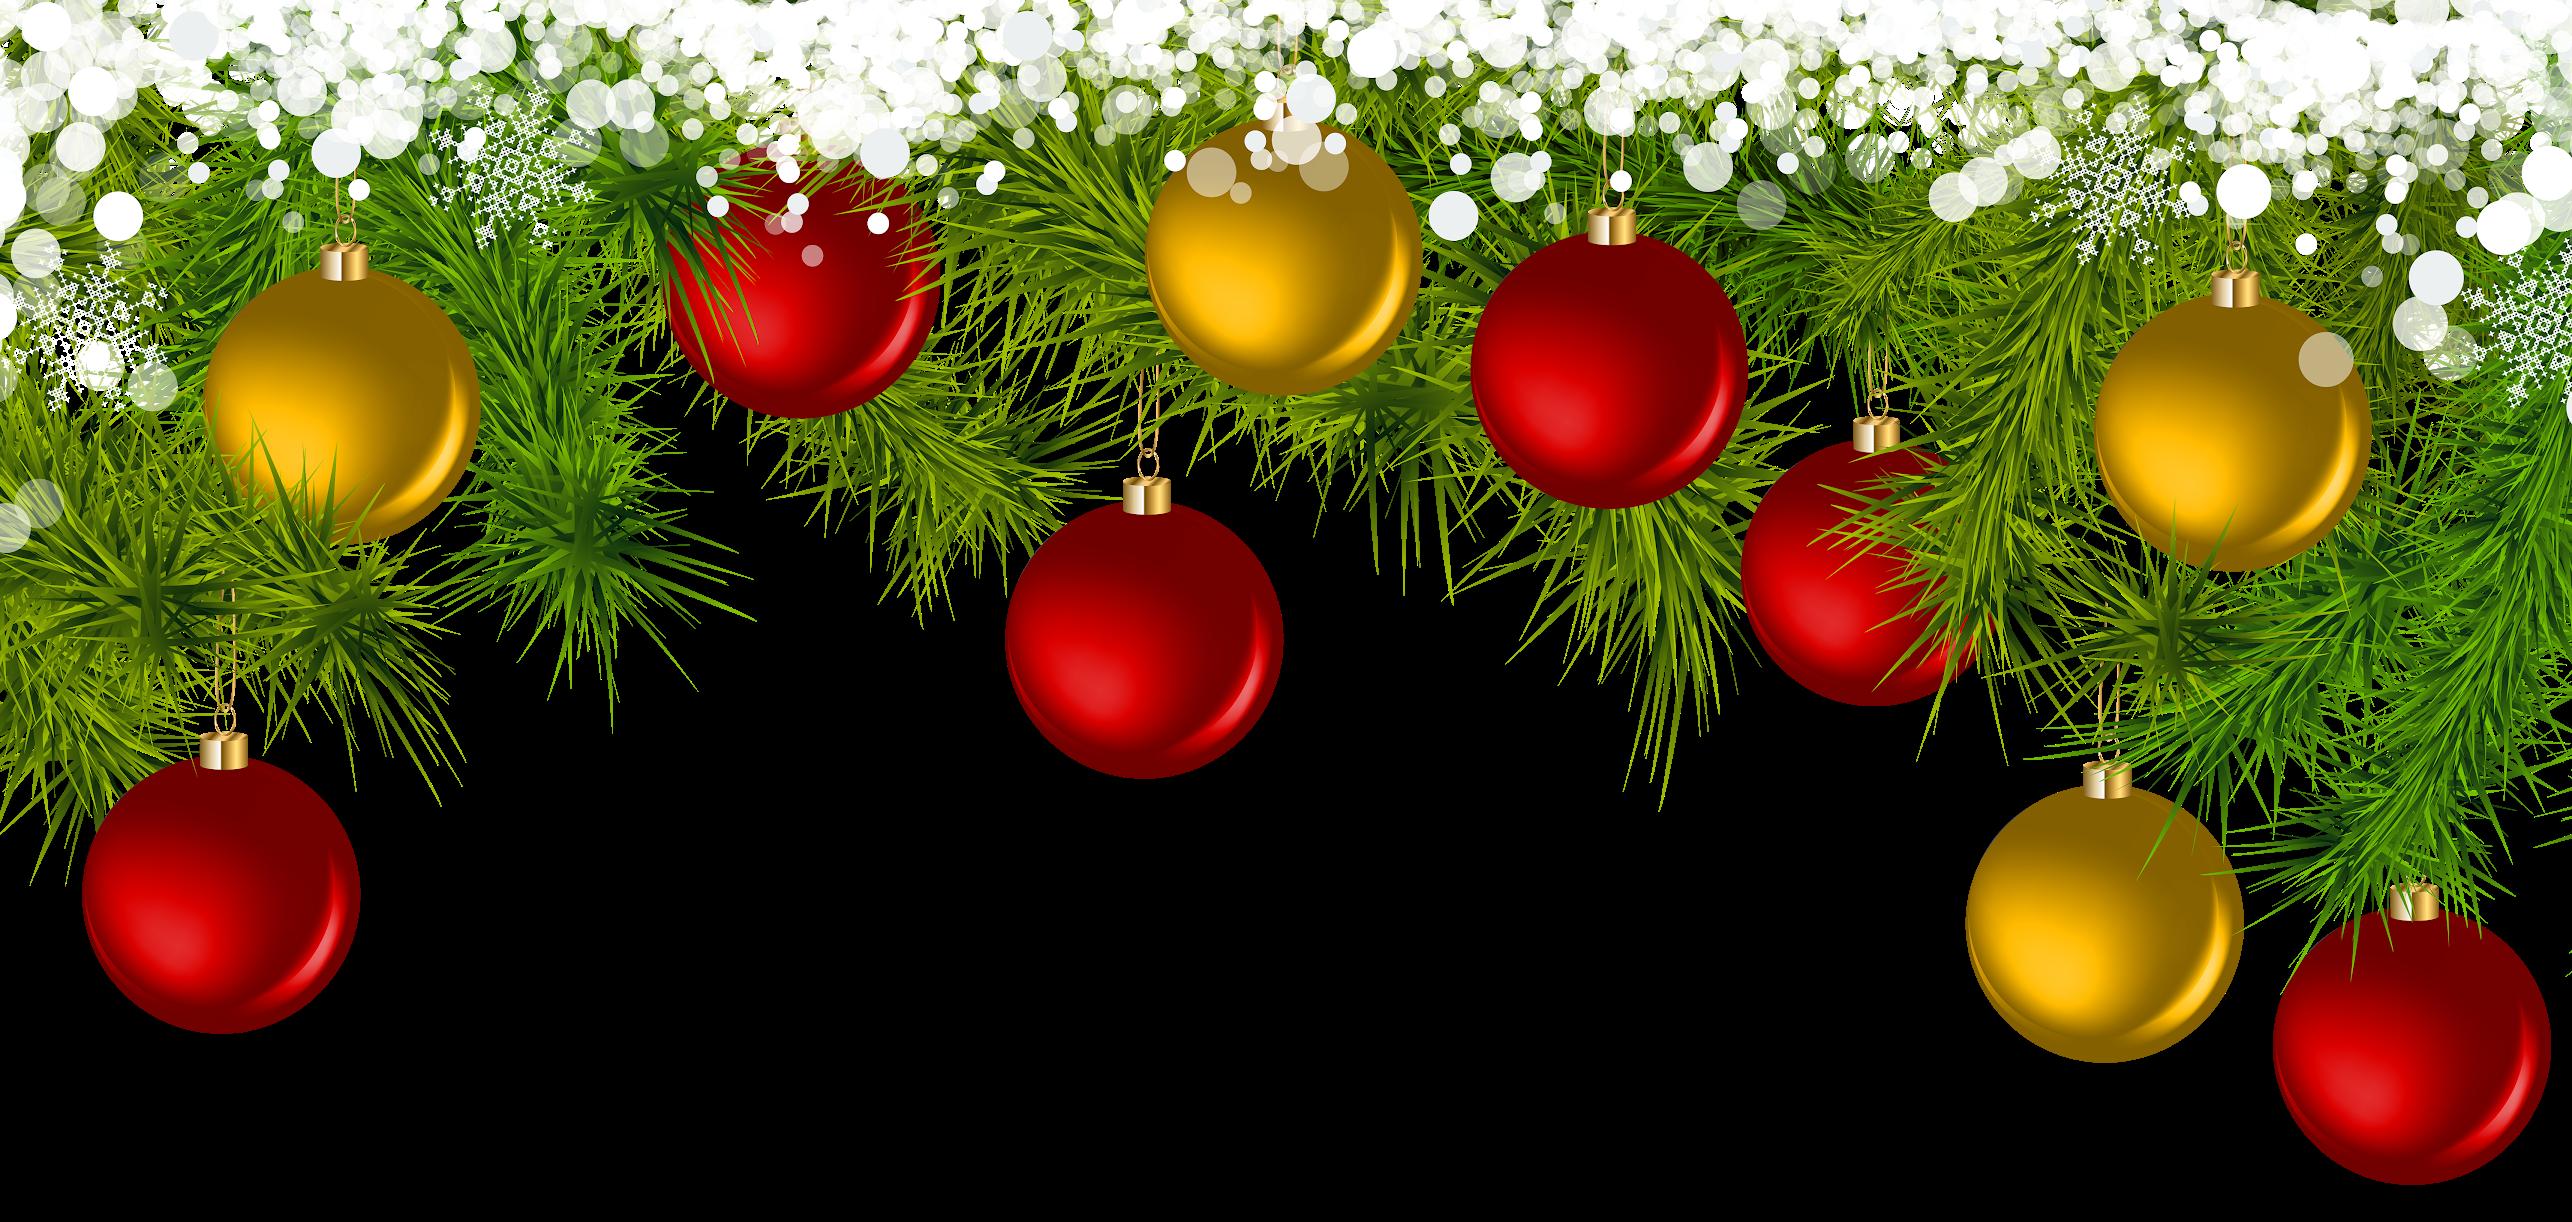 Silver Christmas Balls Png Clipart Christmas Png Image Clipart Christmas Clipart Christmas Balls Christmas Ornaments